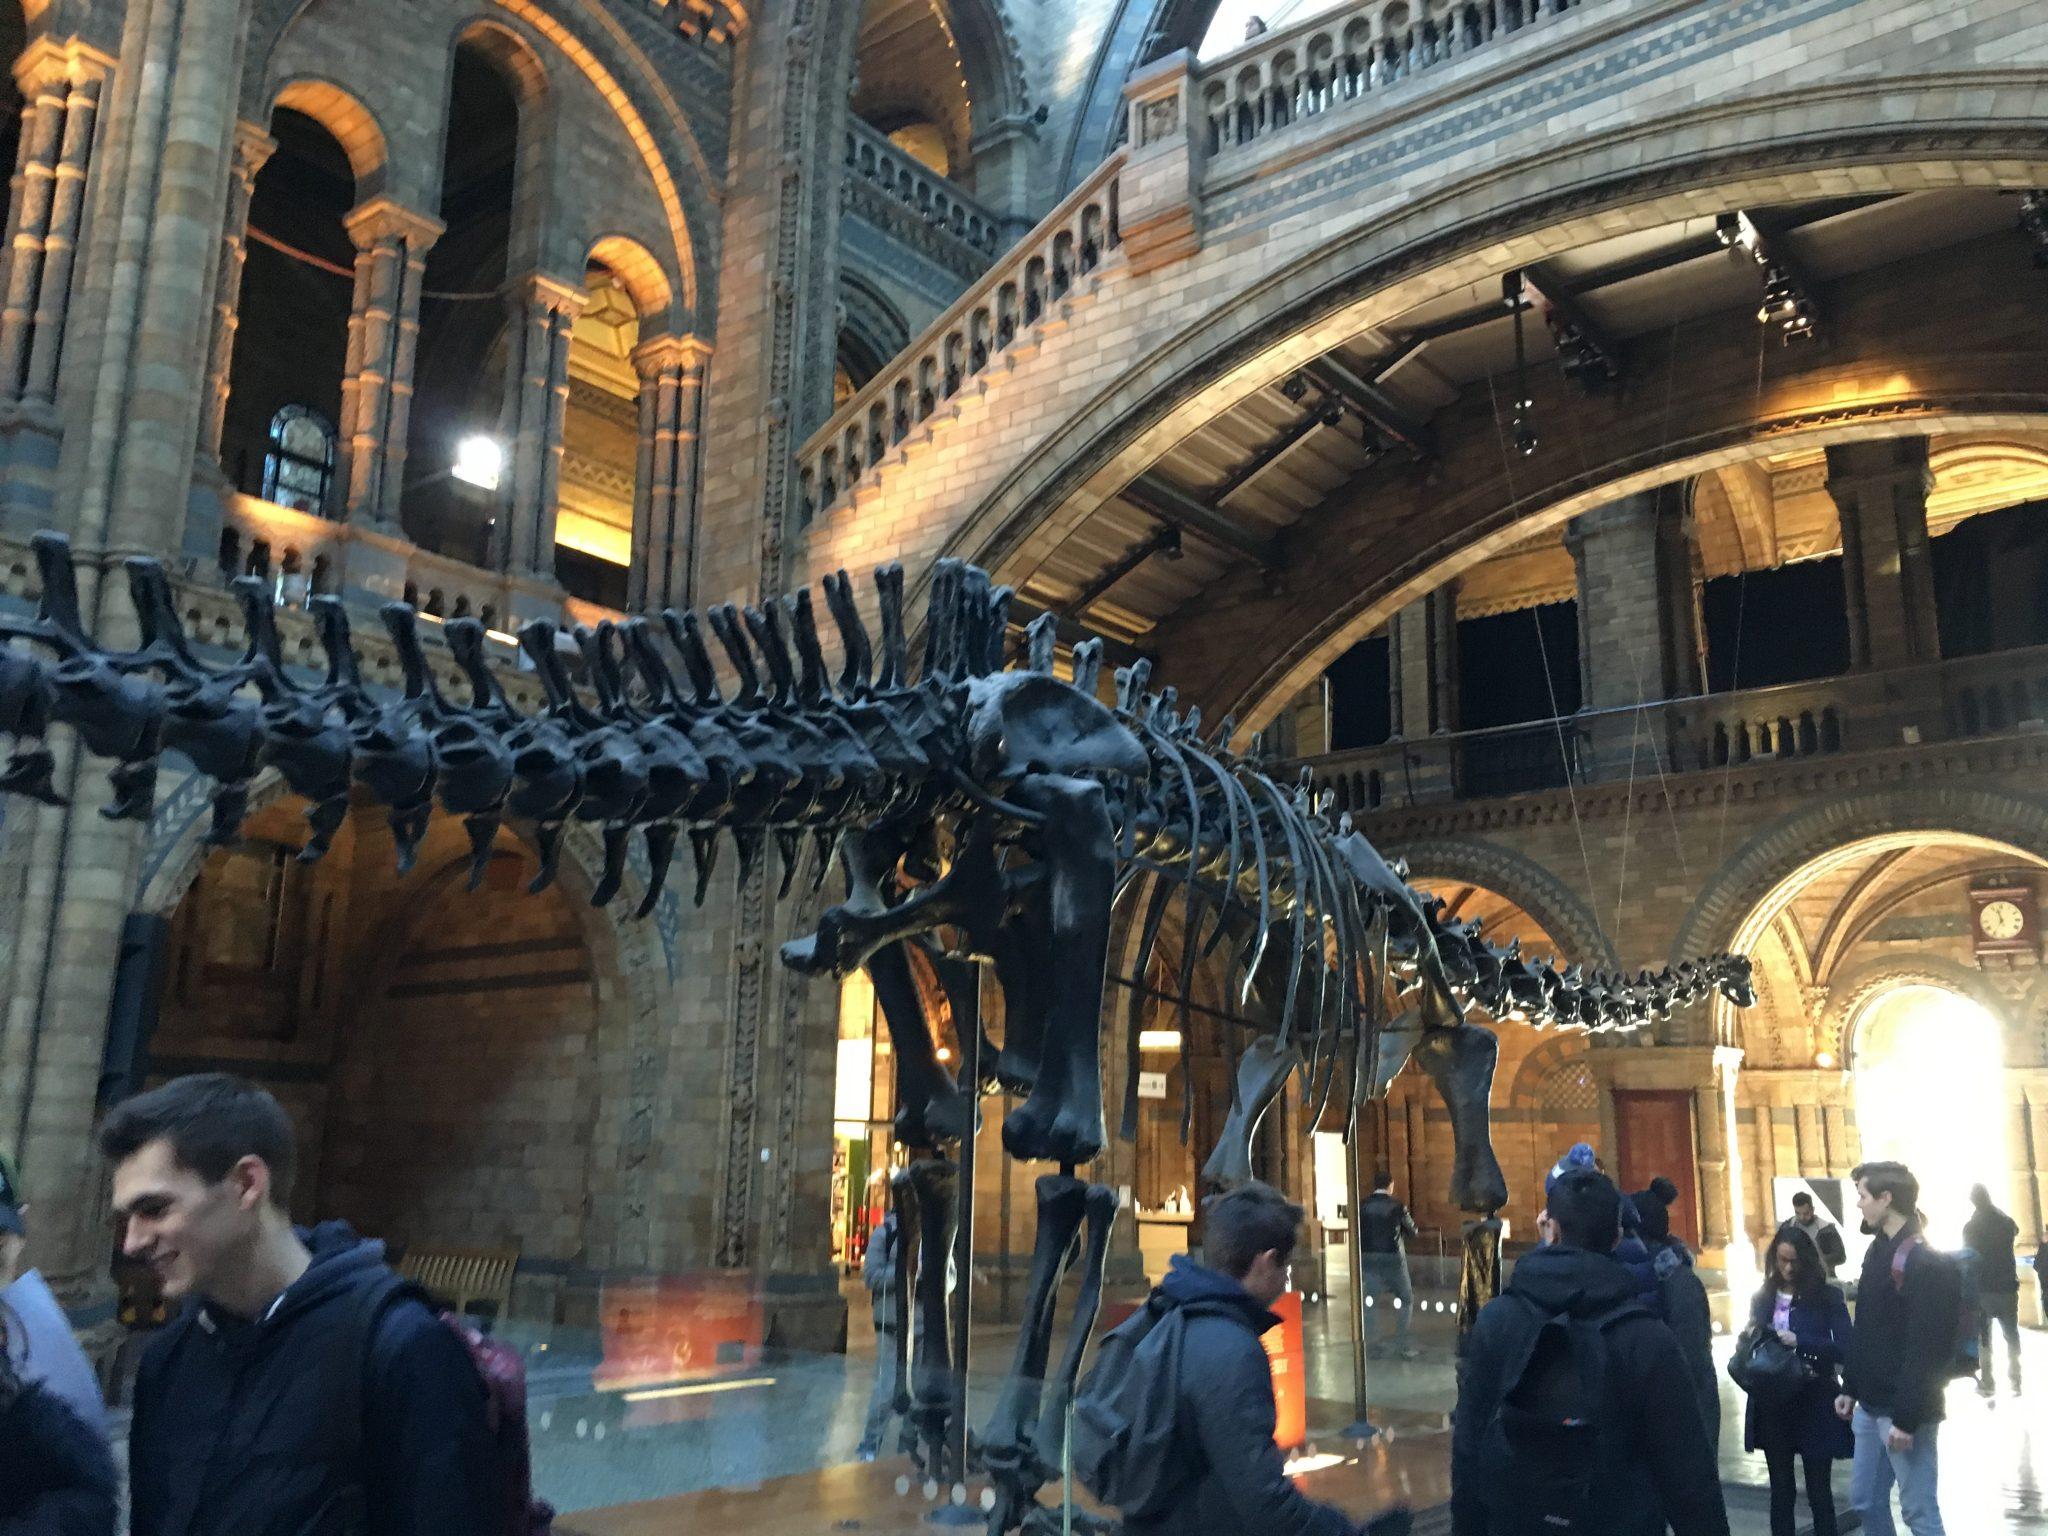 Scopriamo insieme il Natural History Museum di Londra - Mum what else